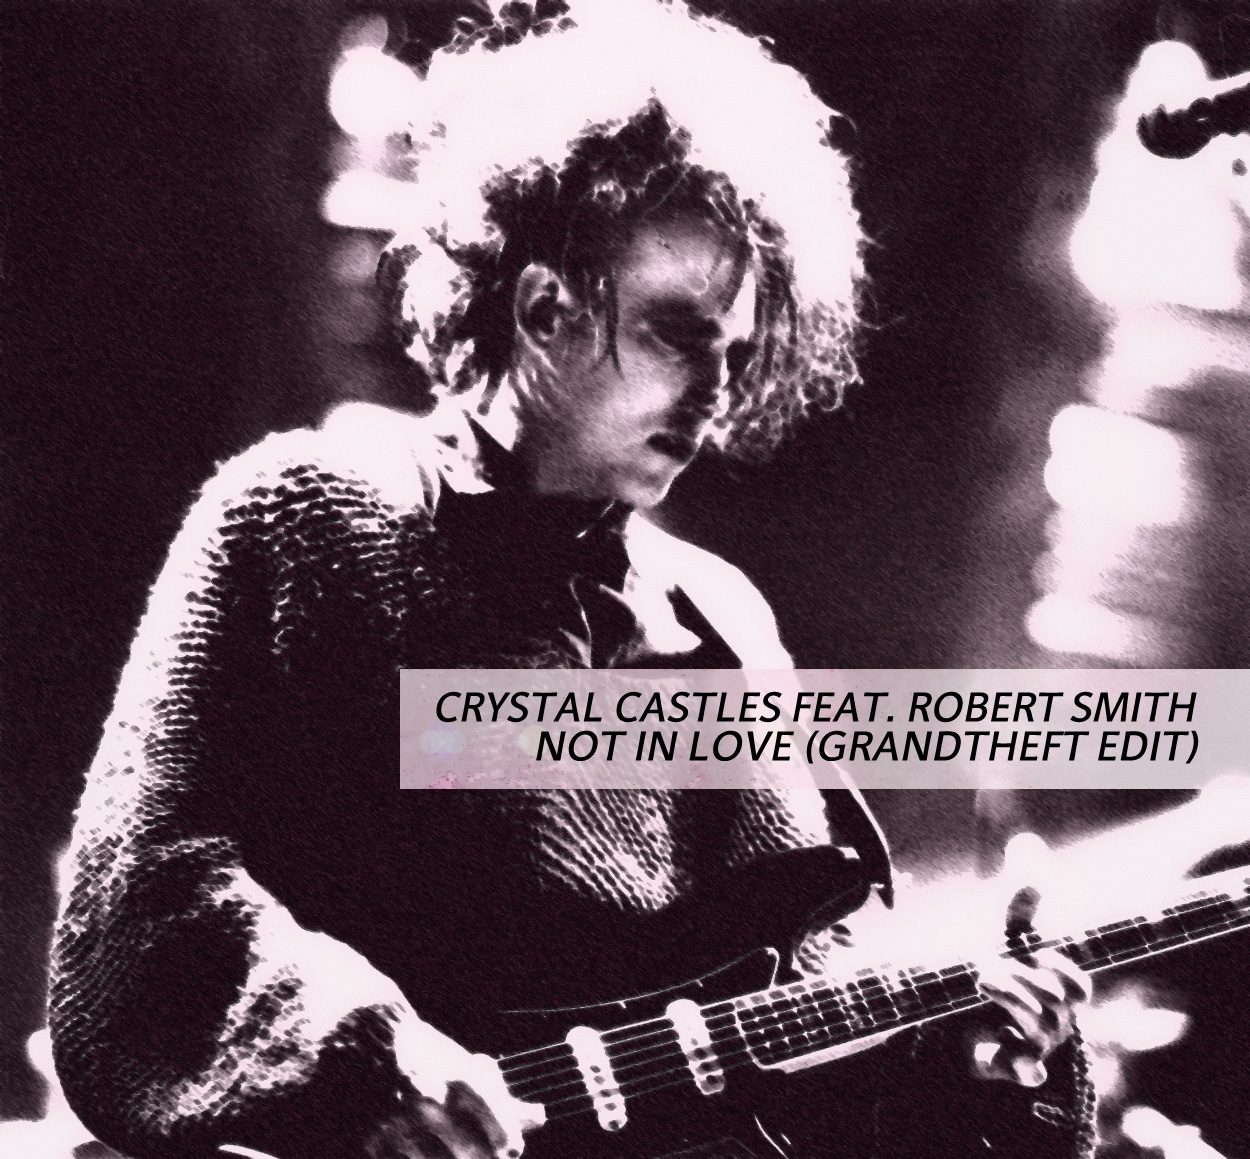 Crystal Castles featuring Robert Smith – Not In Love (Grandtheft Edit)